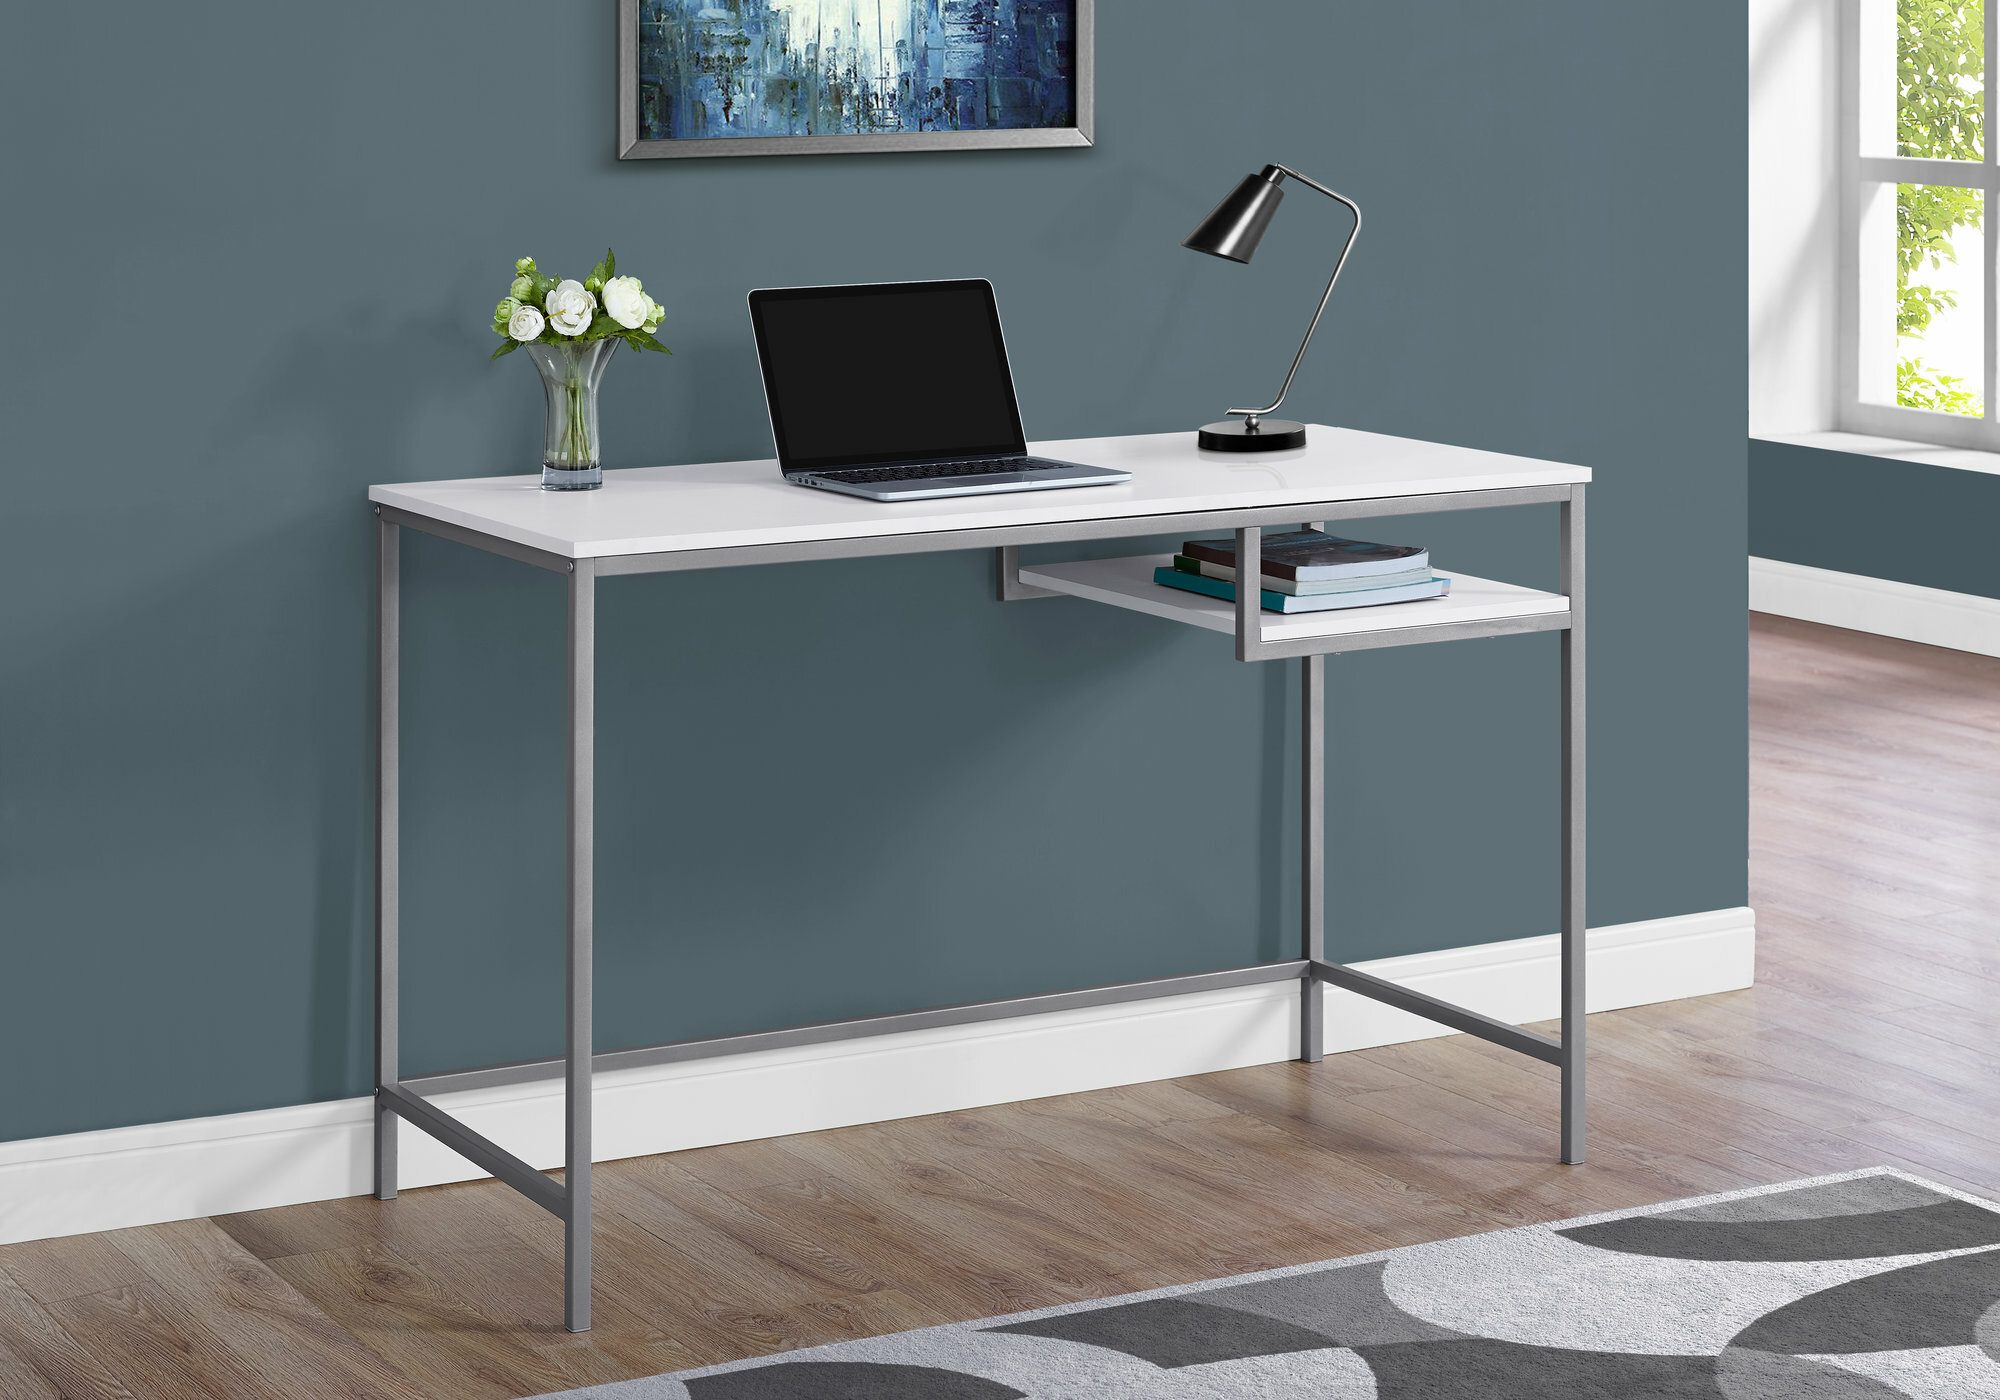 Delicieux Camire Computer Desk